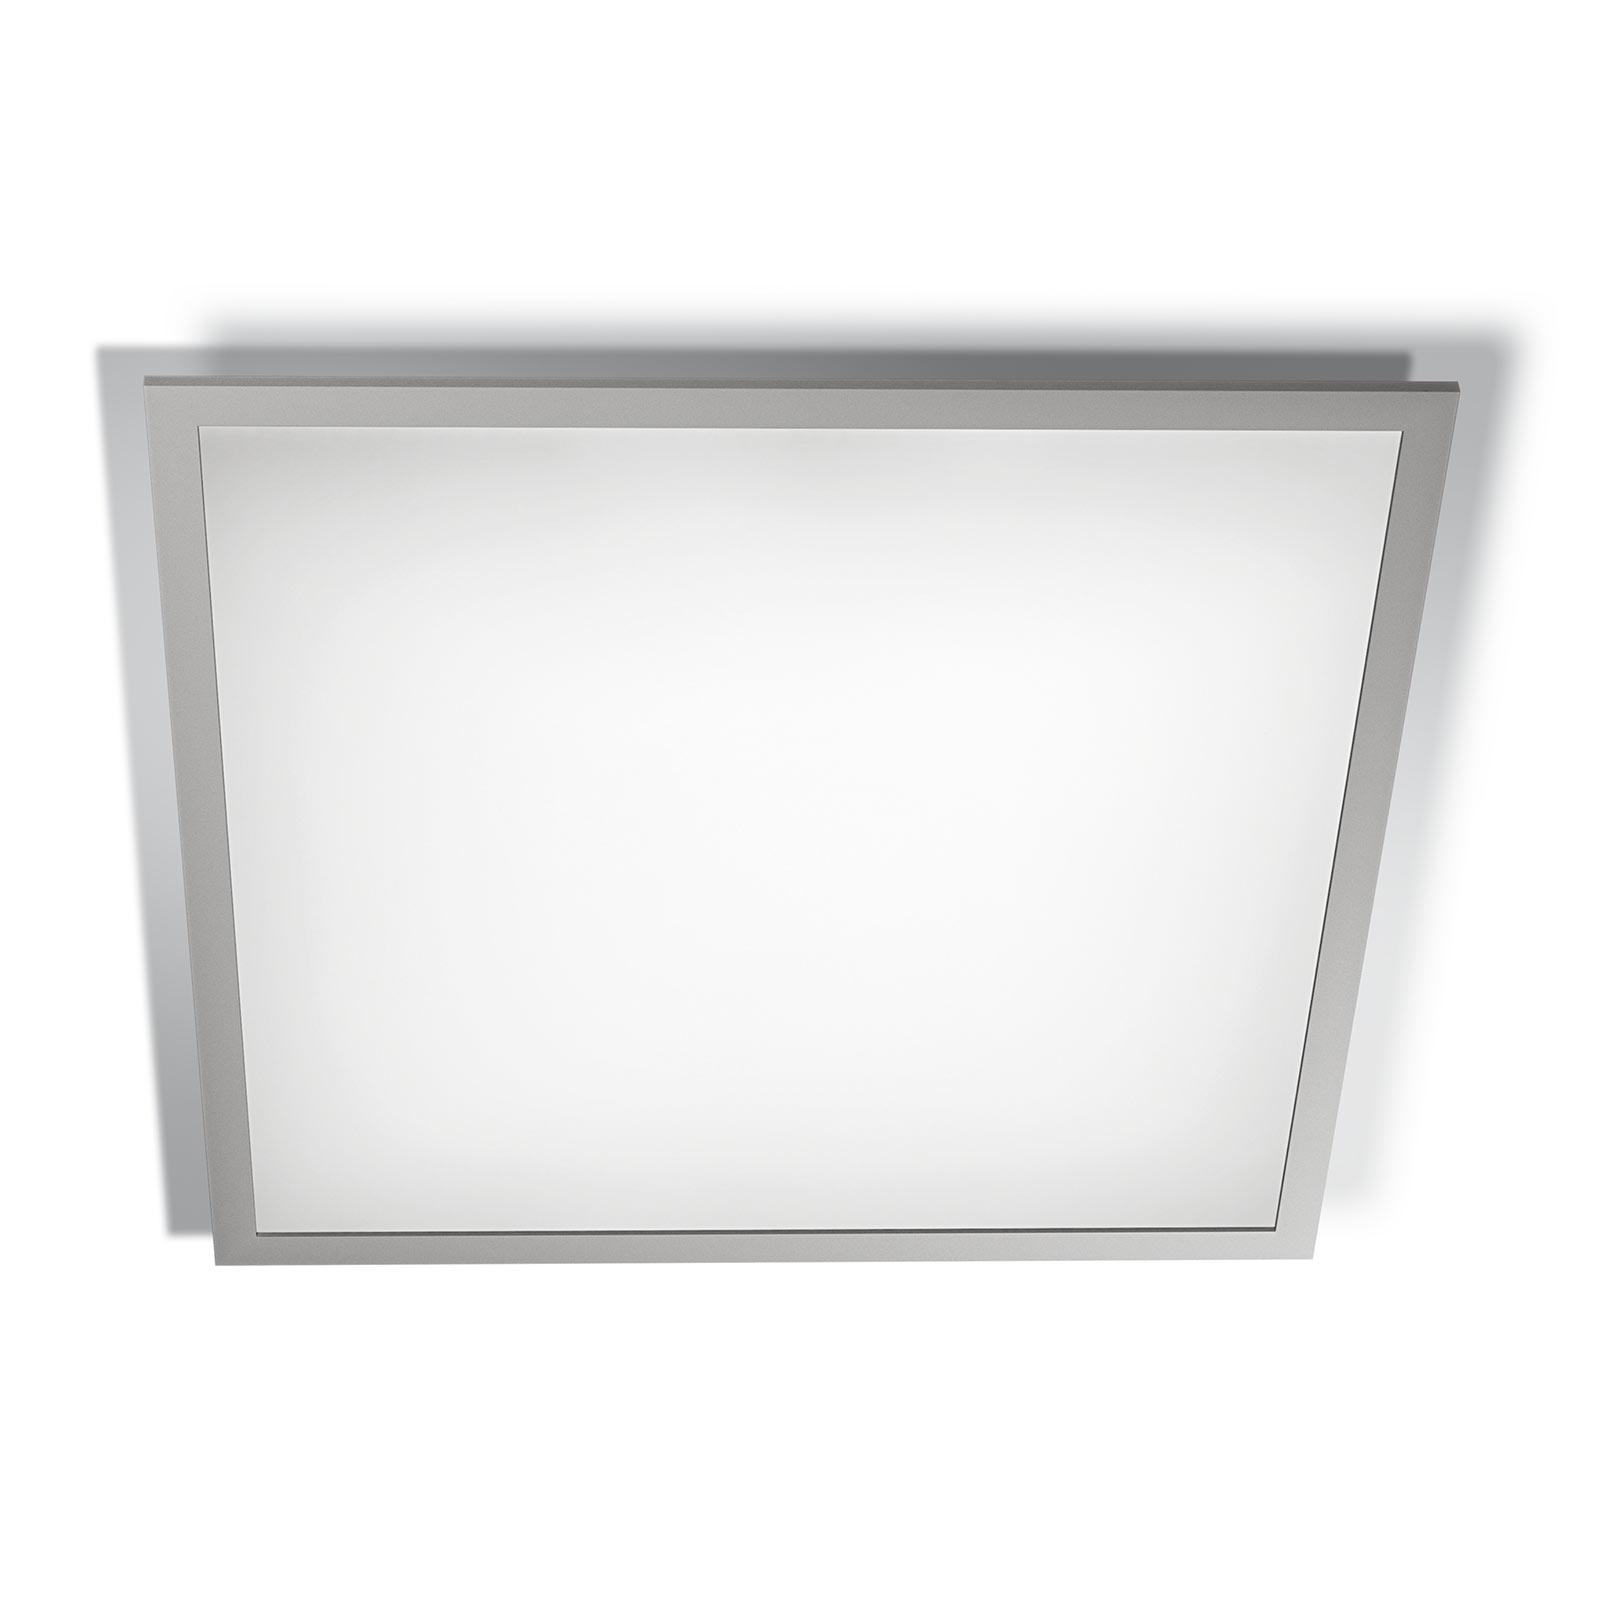 LEDVANCE Planon Plus LED-Panel 60cm 840 36W